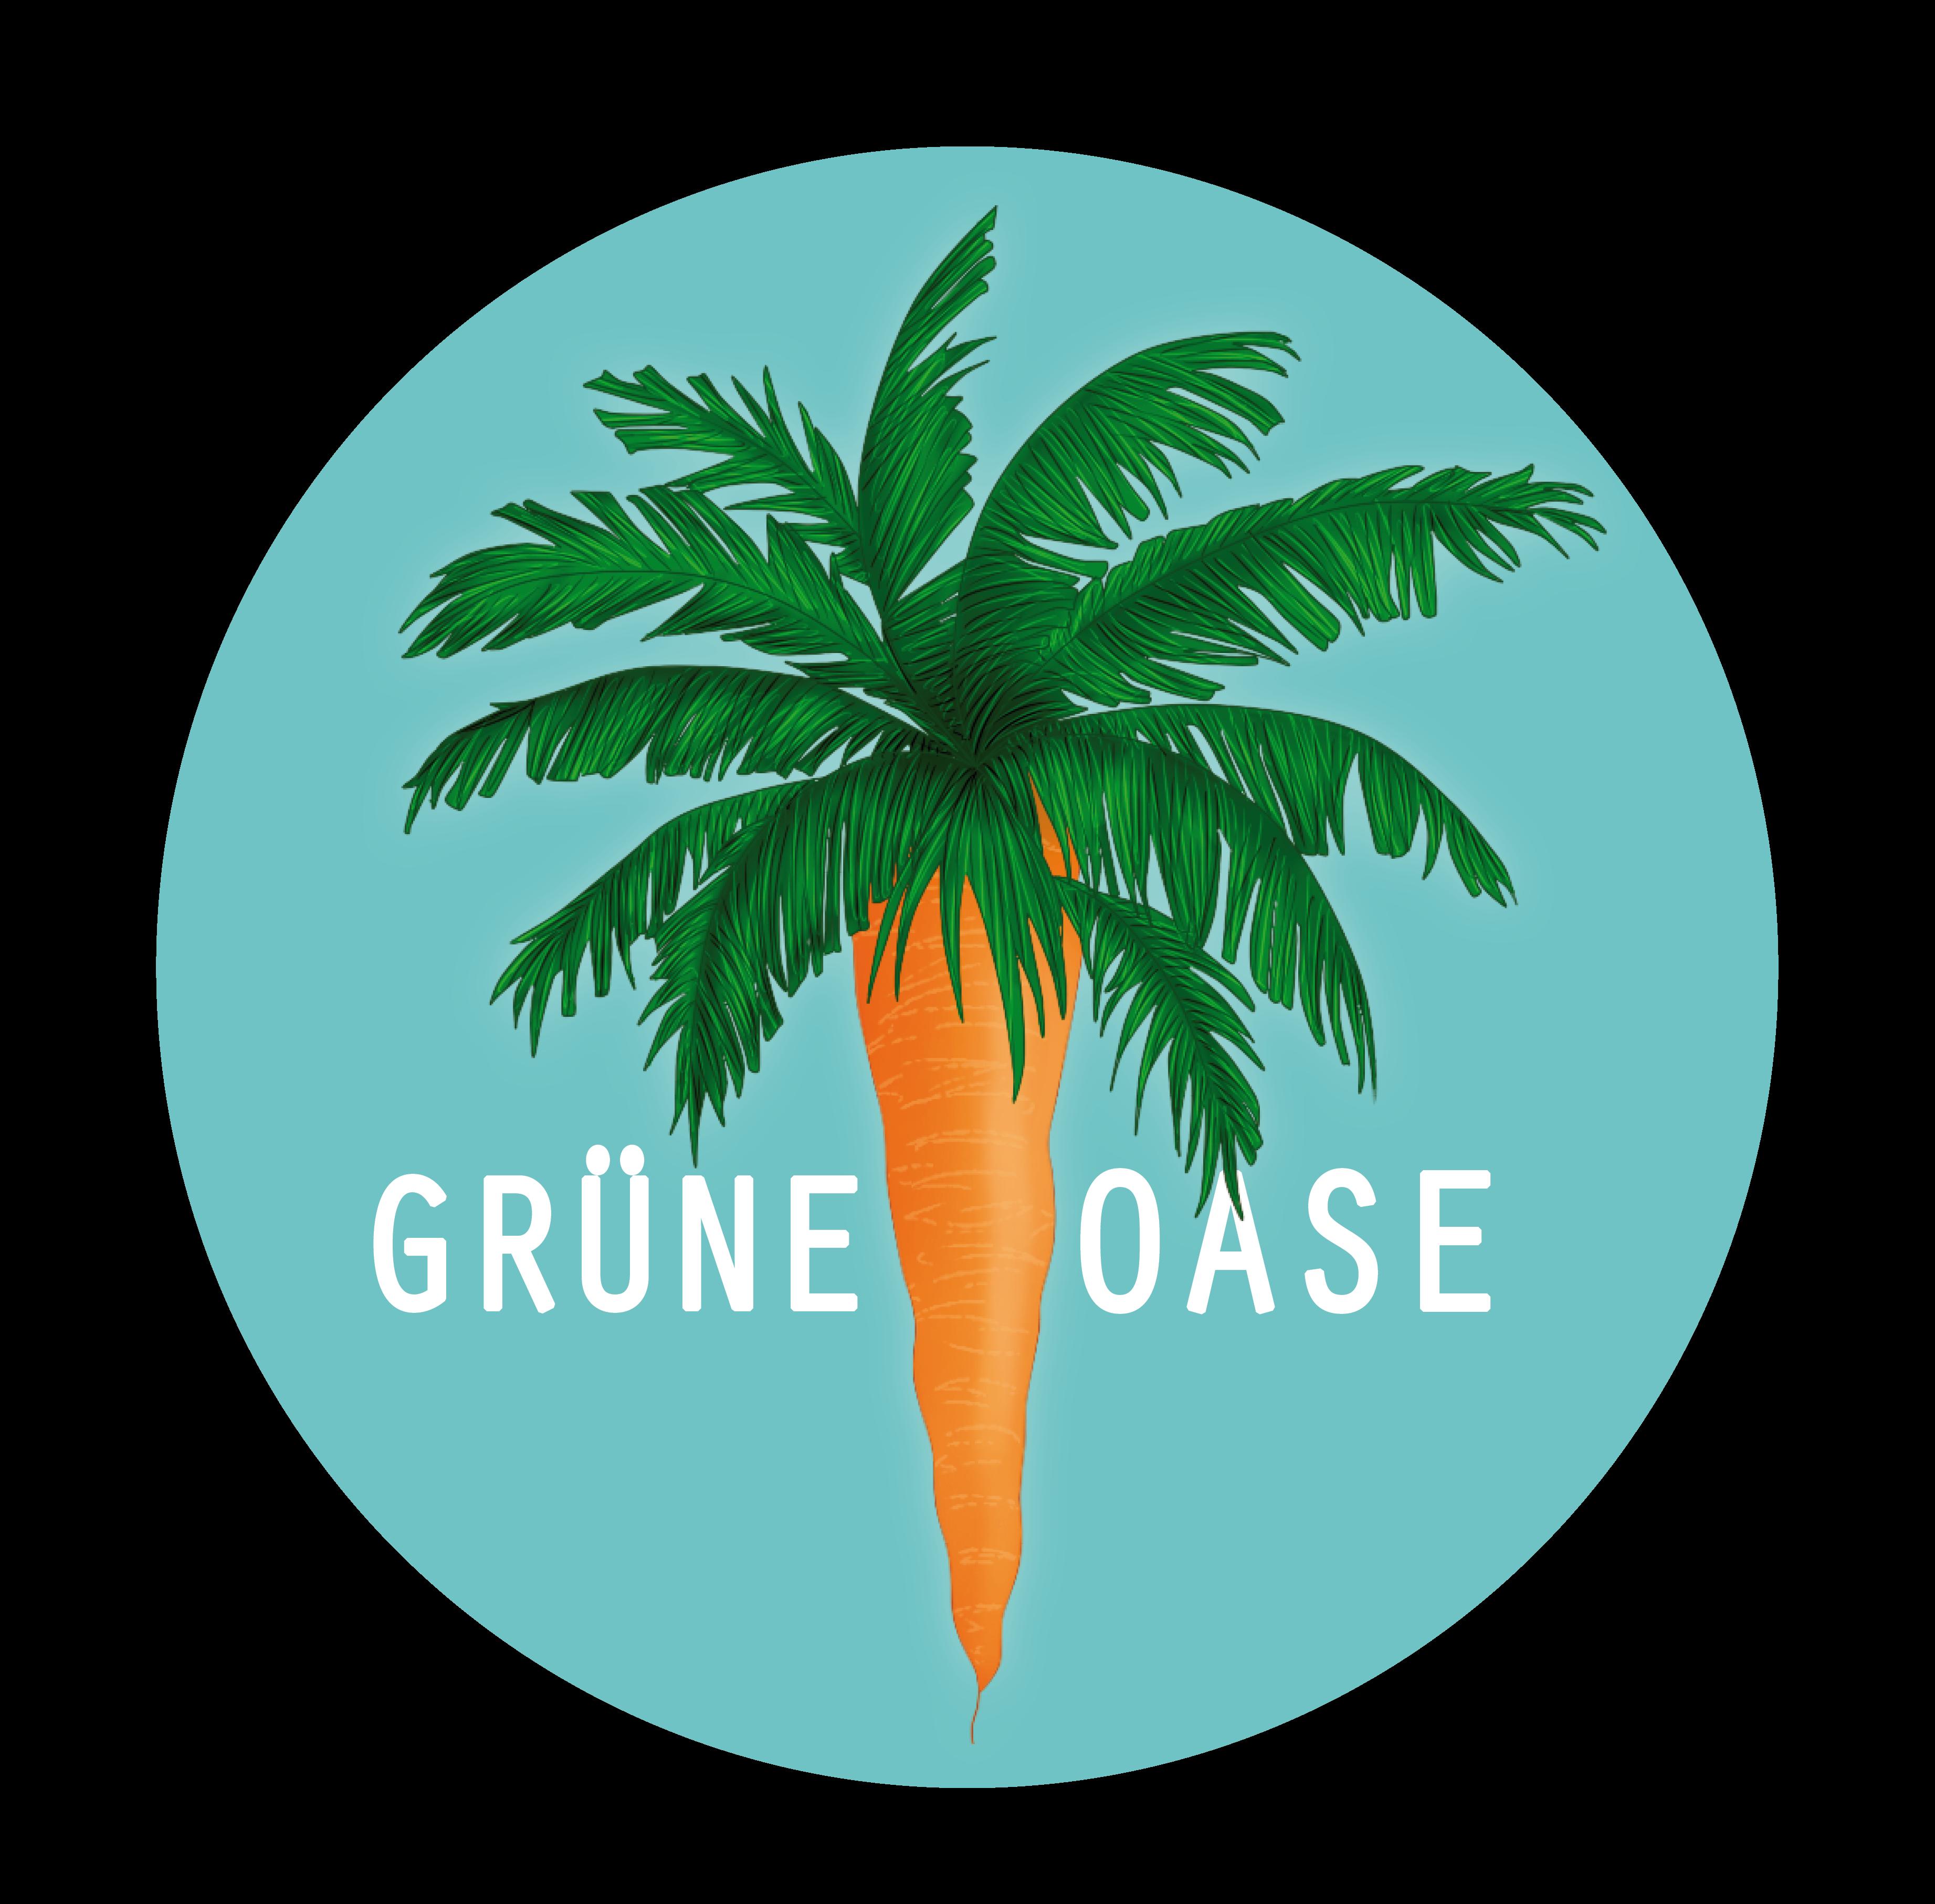 Grüne Oase im Mädchen_kulturhaus